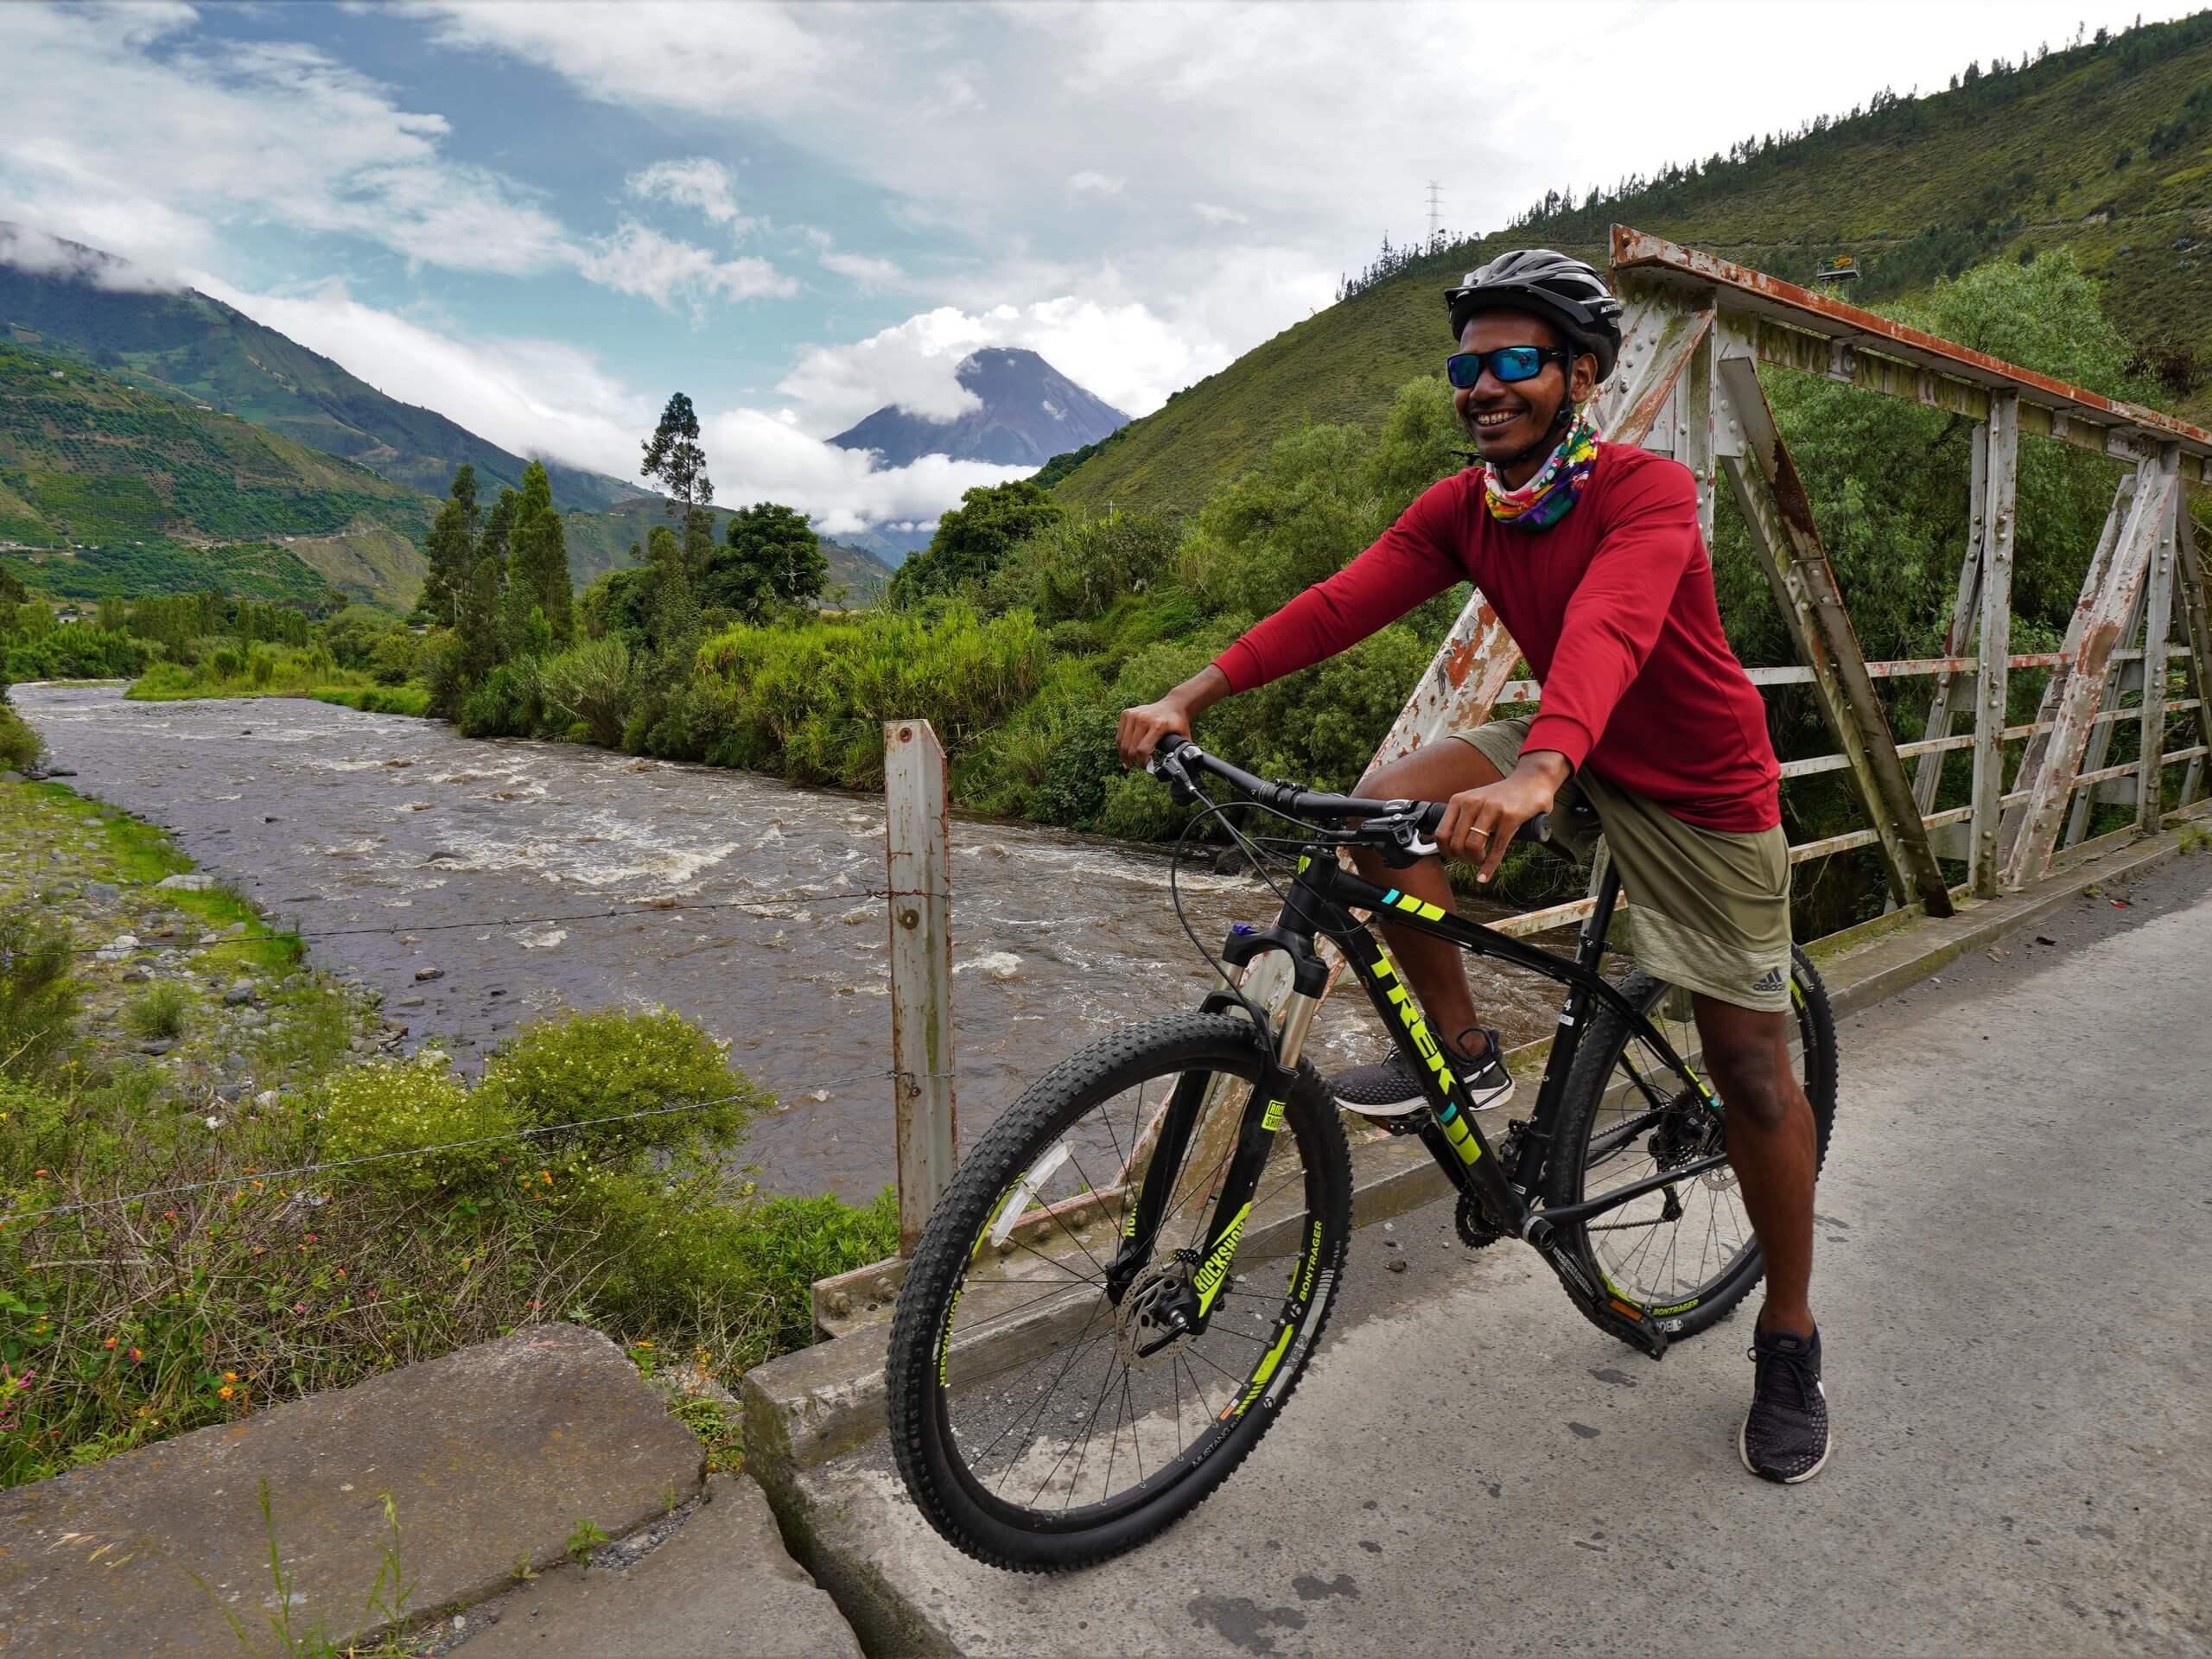 Biker crossing the bridge over the river near Banos